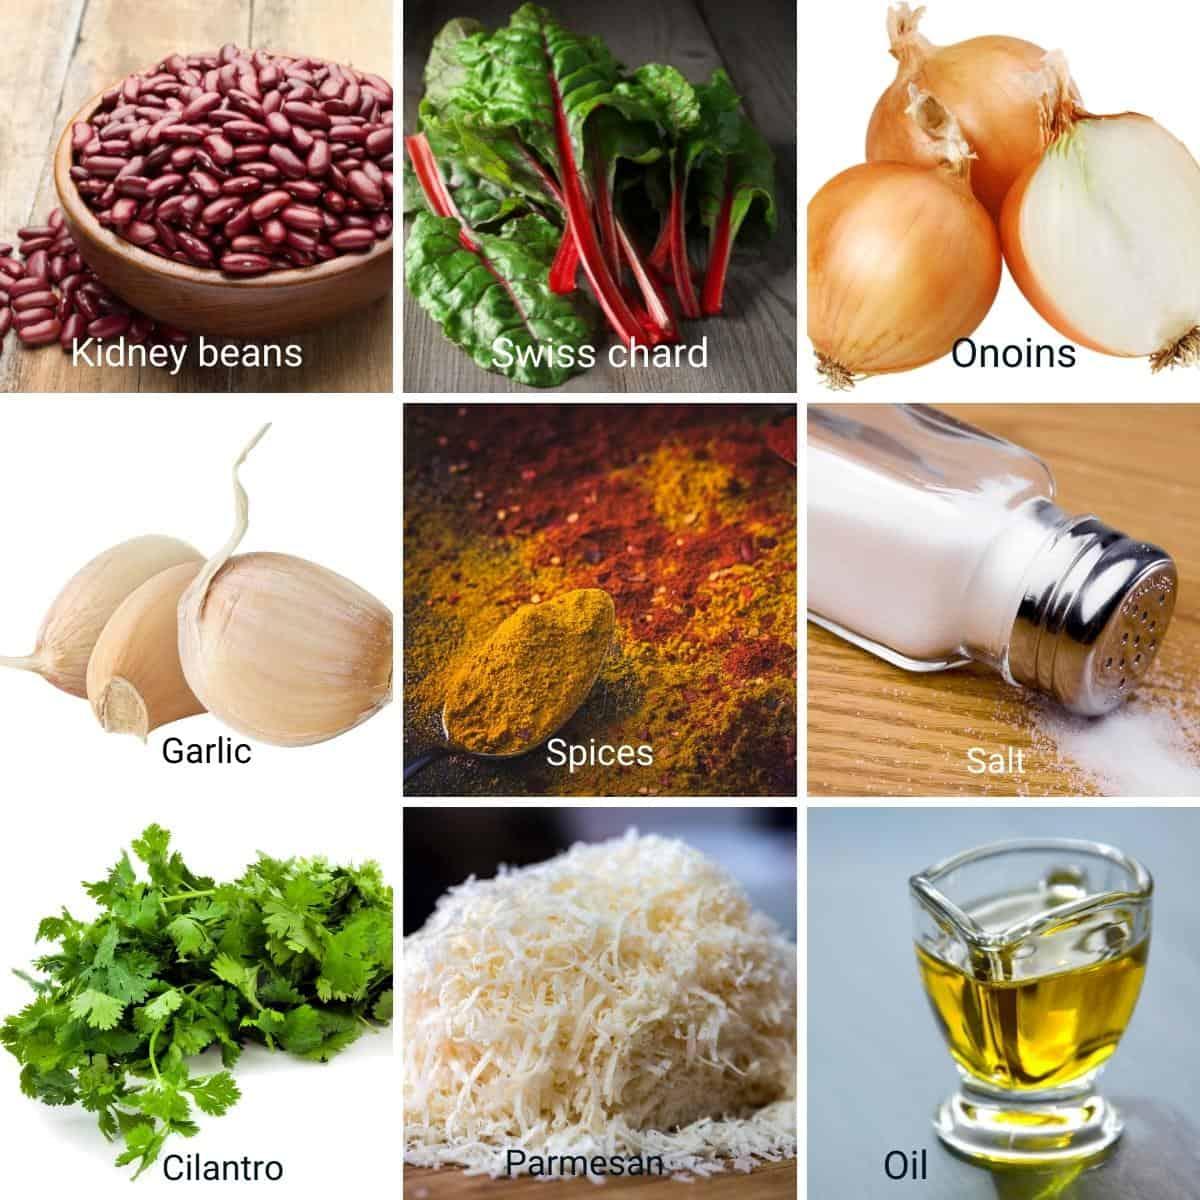 Ingredients for making vegan kidney beans patties.